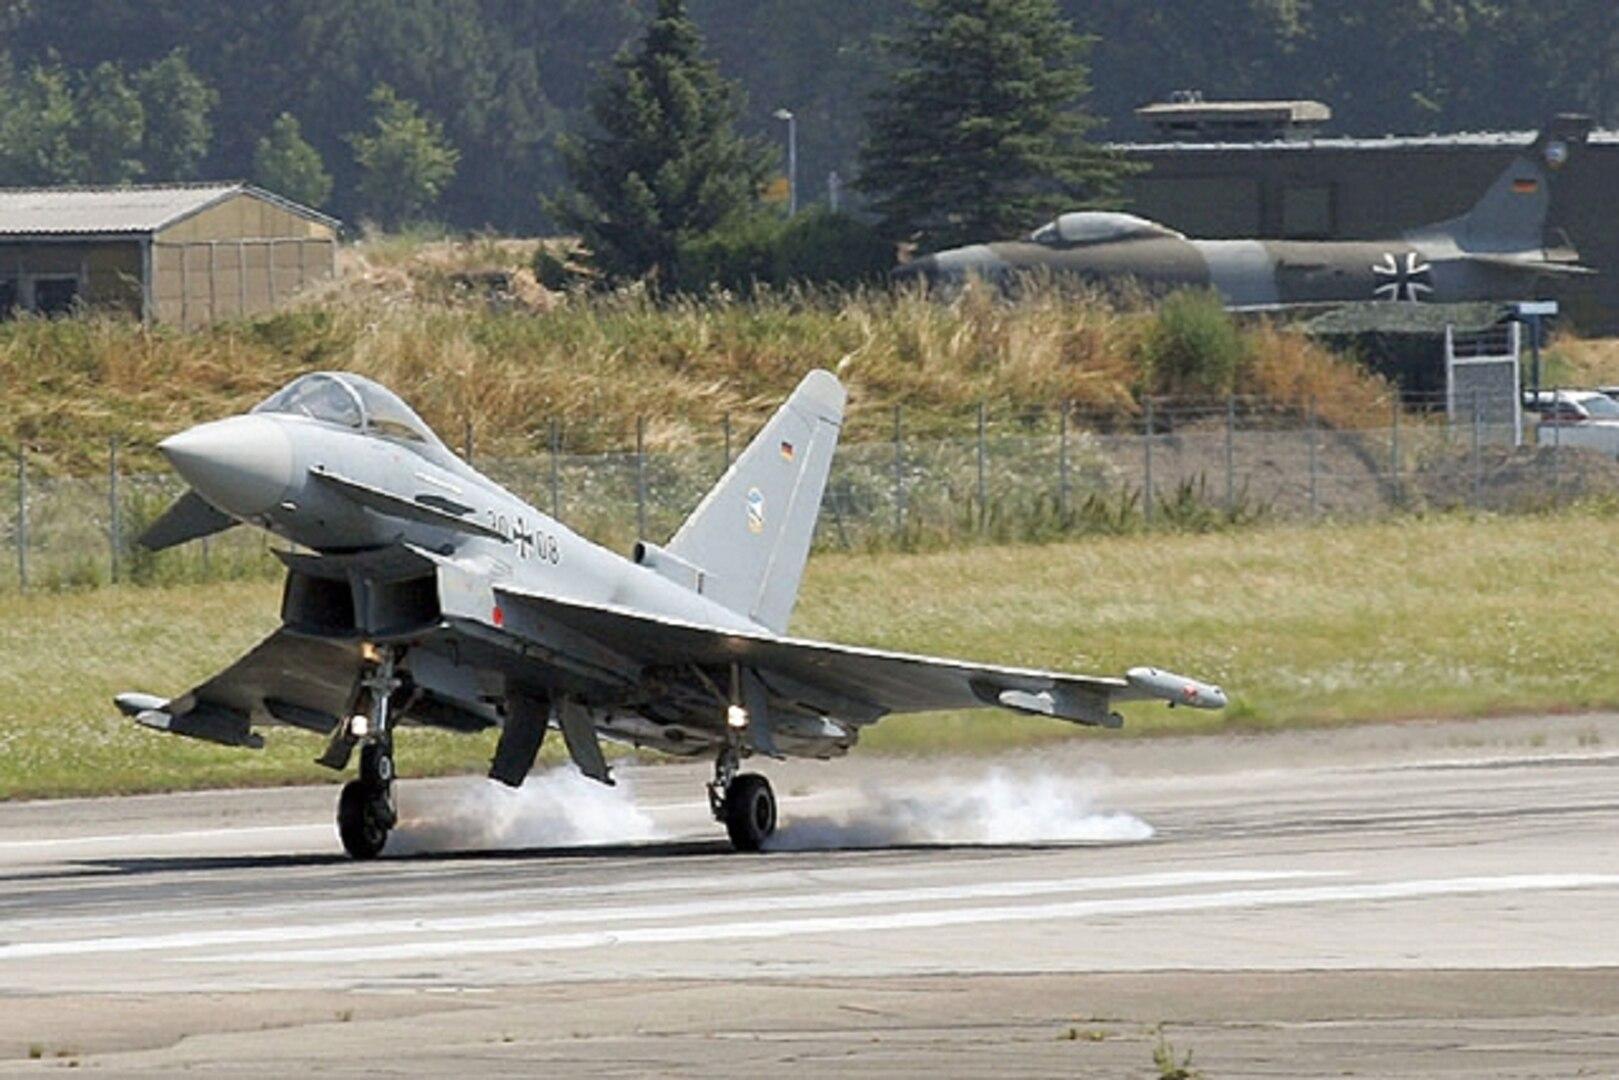 Germany's Eurofighter Typhoon